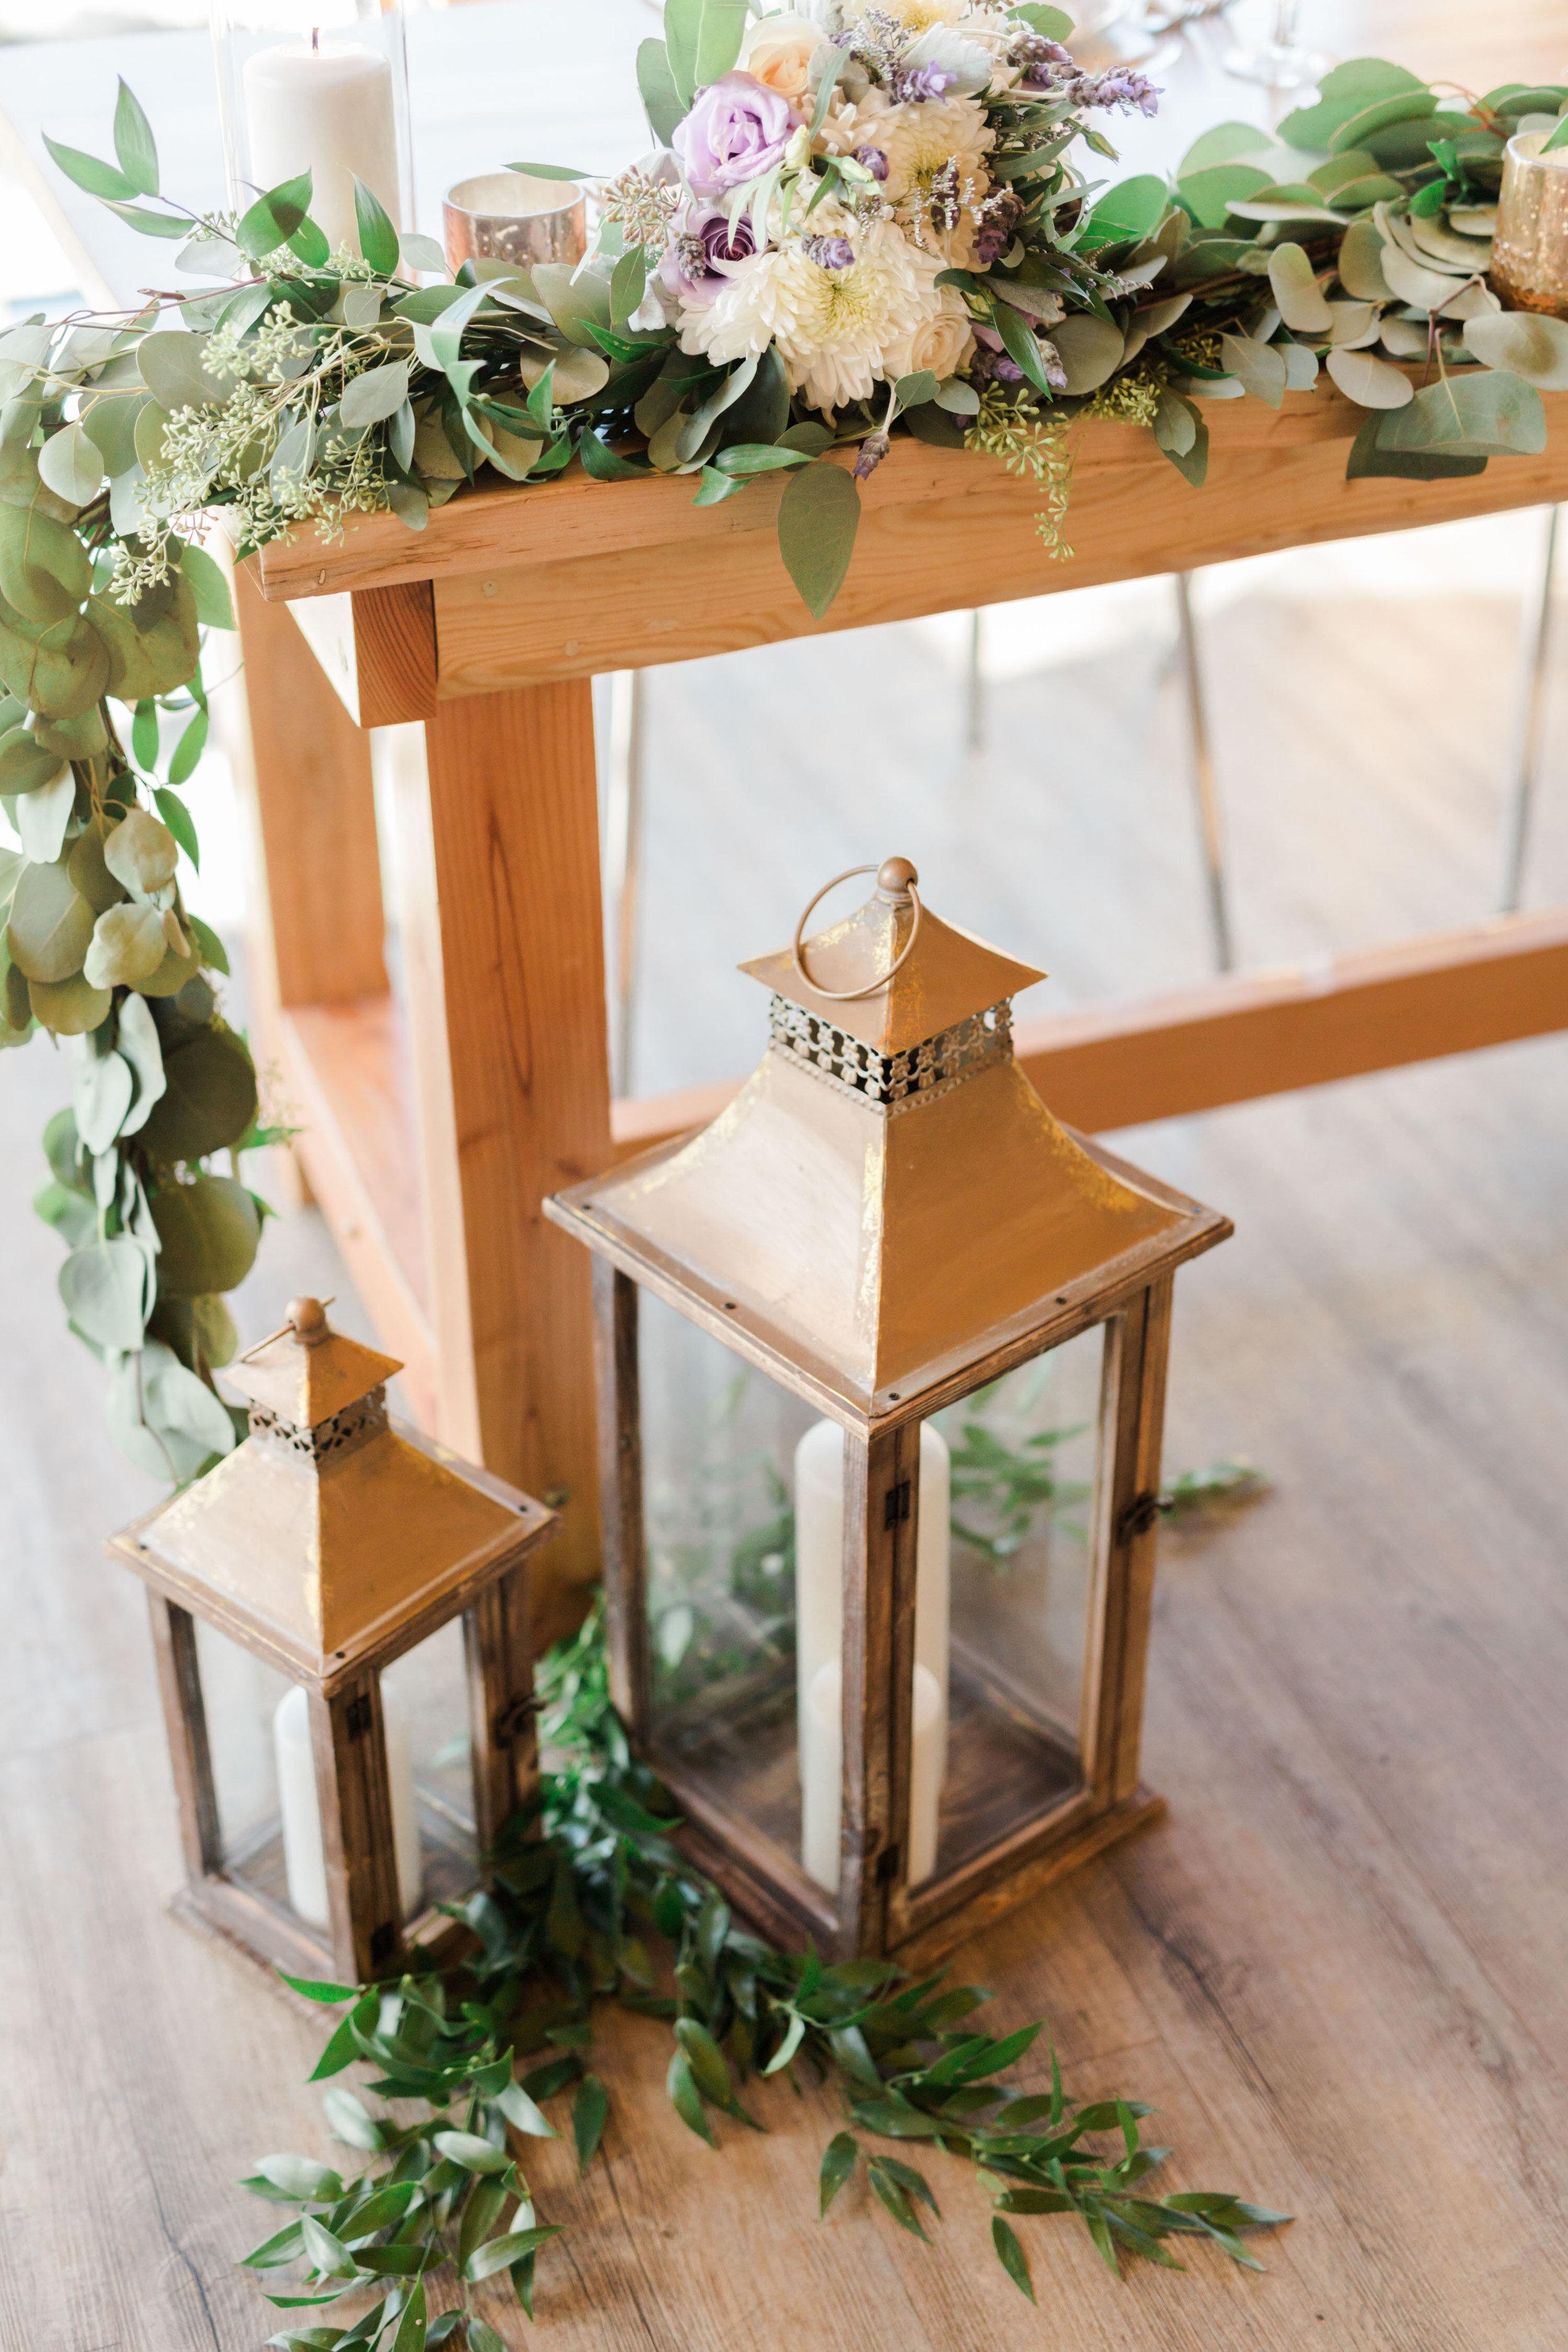 Squamish Wedding Photographer - Sea to Sky Gondola Wedding Photos -  Vancouver Wedding Photographer & Videographer - Sunshine Coast Wedding Photos - Sunshine Coast Wedding Photographer - Jennifer Picard Photography - IMG_4007_1.jpg